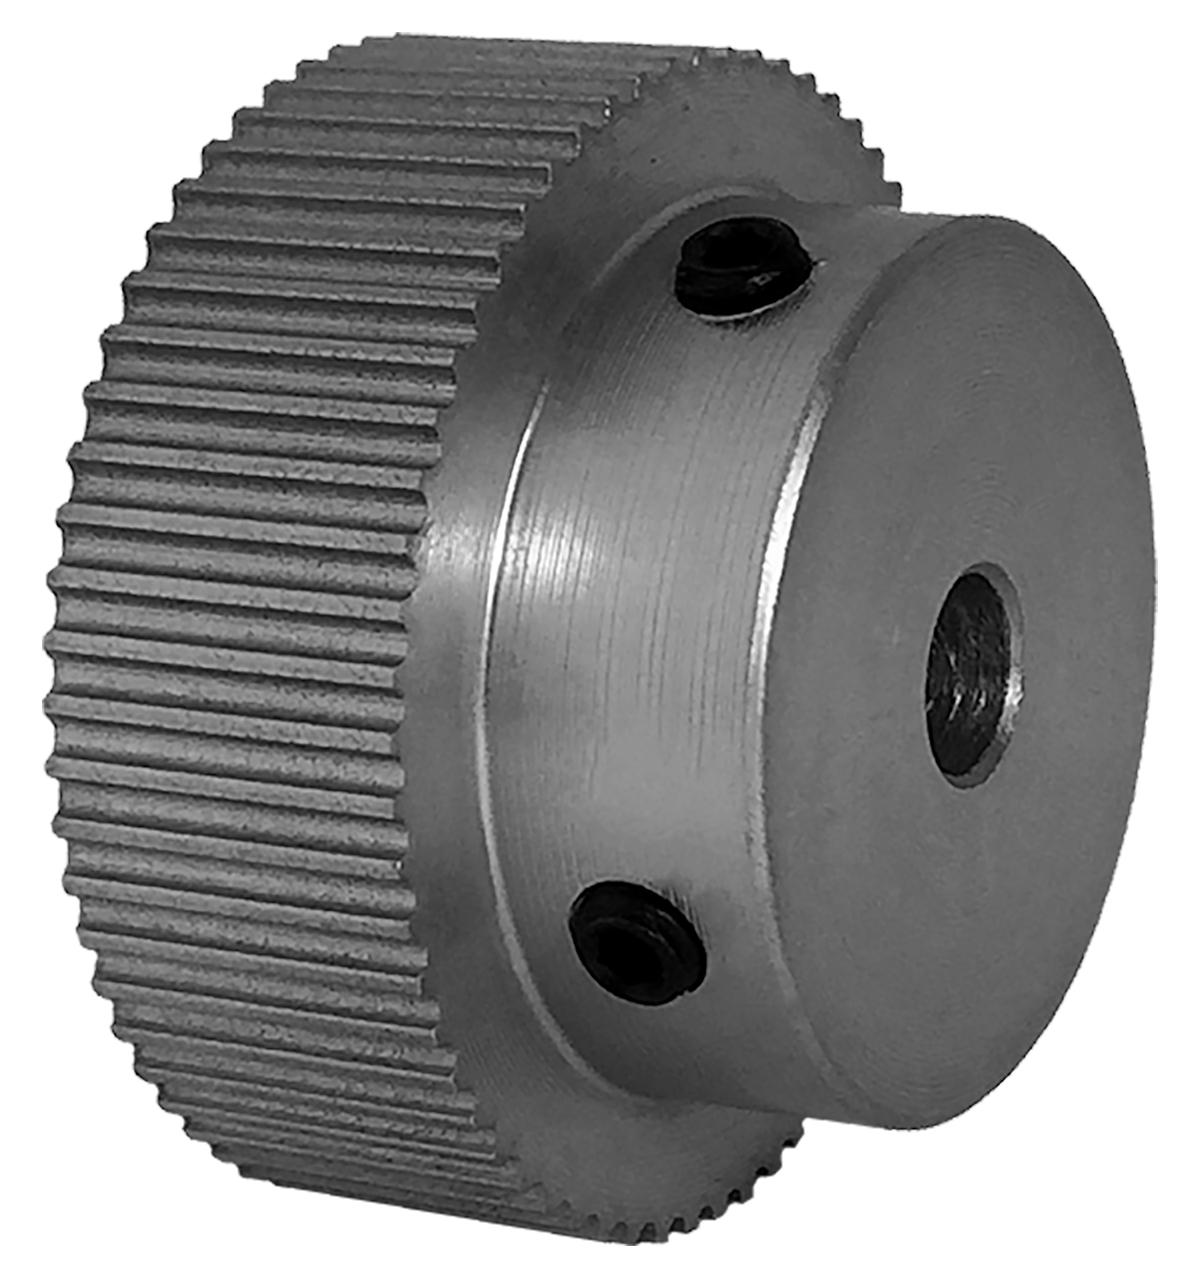 62-2P09-6A3 - Aluminum Powerhouse® Pulleys